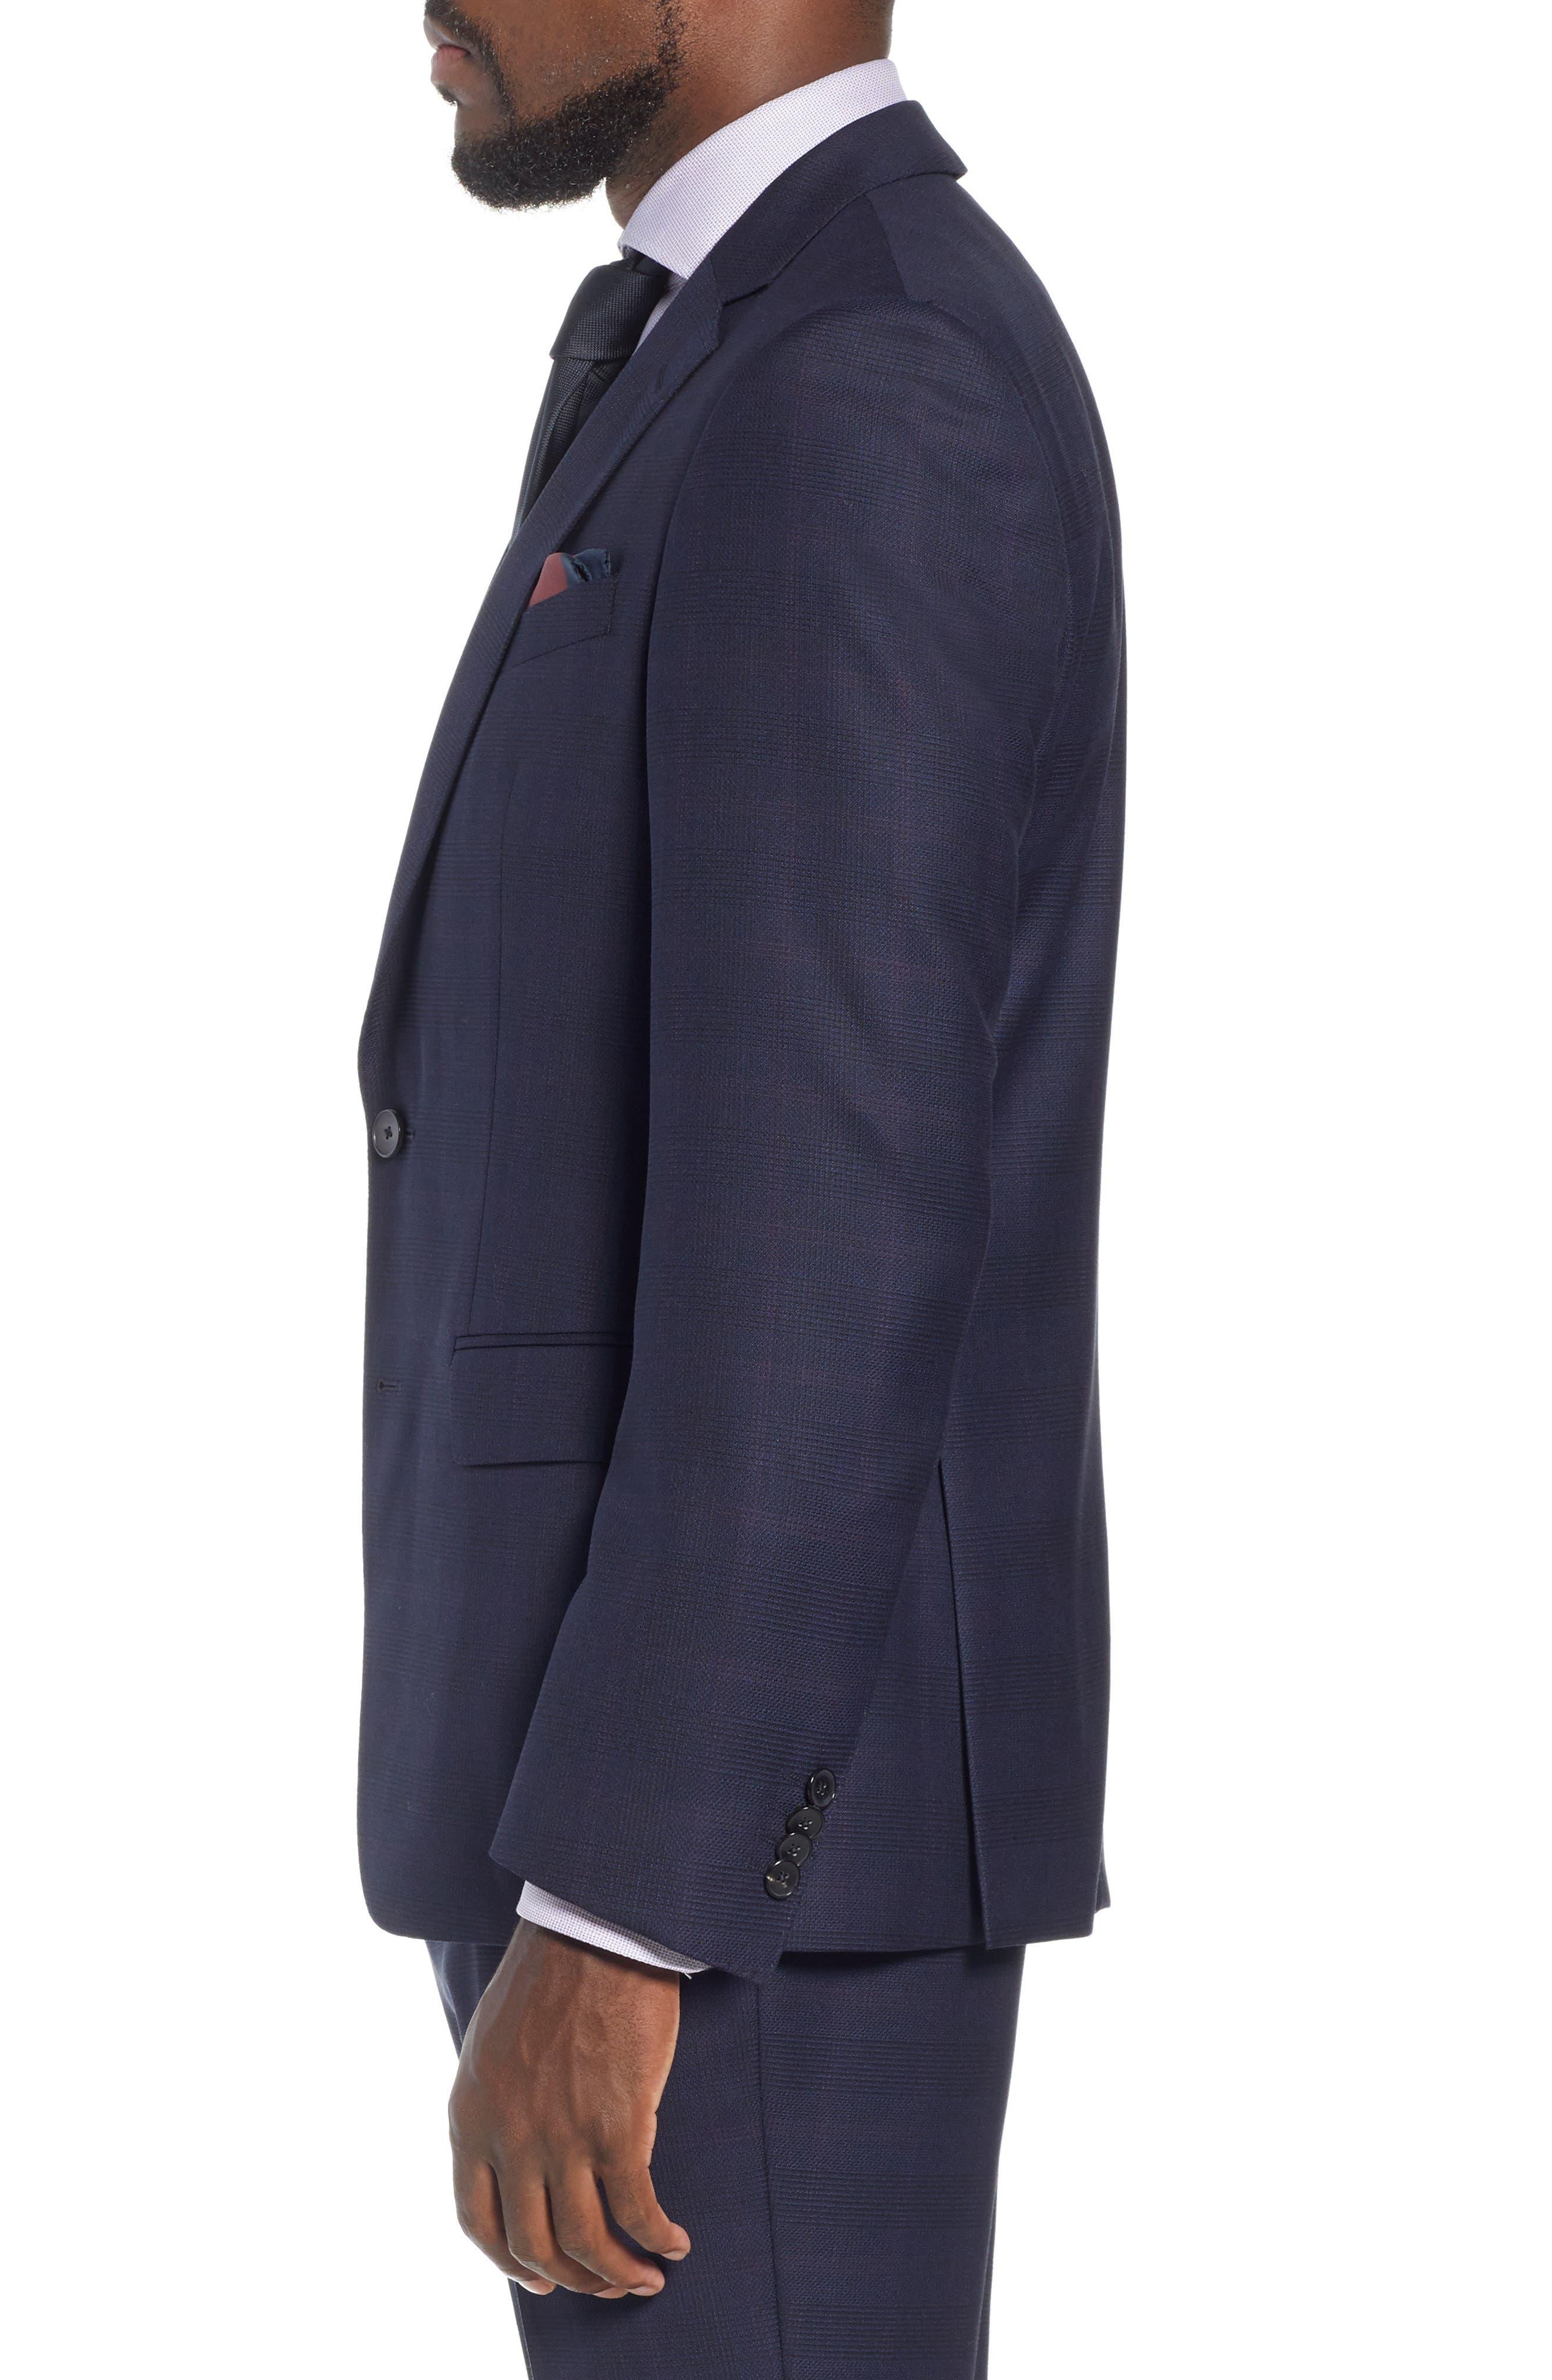 x Nordstrom Huge/Genius Trim Fit Plaid Wool Suit,                             Alternate thumbnail 3, color,                             NAVY